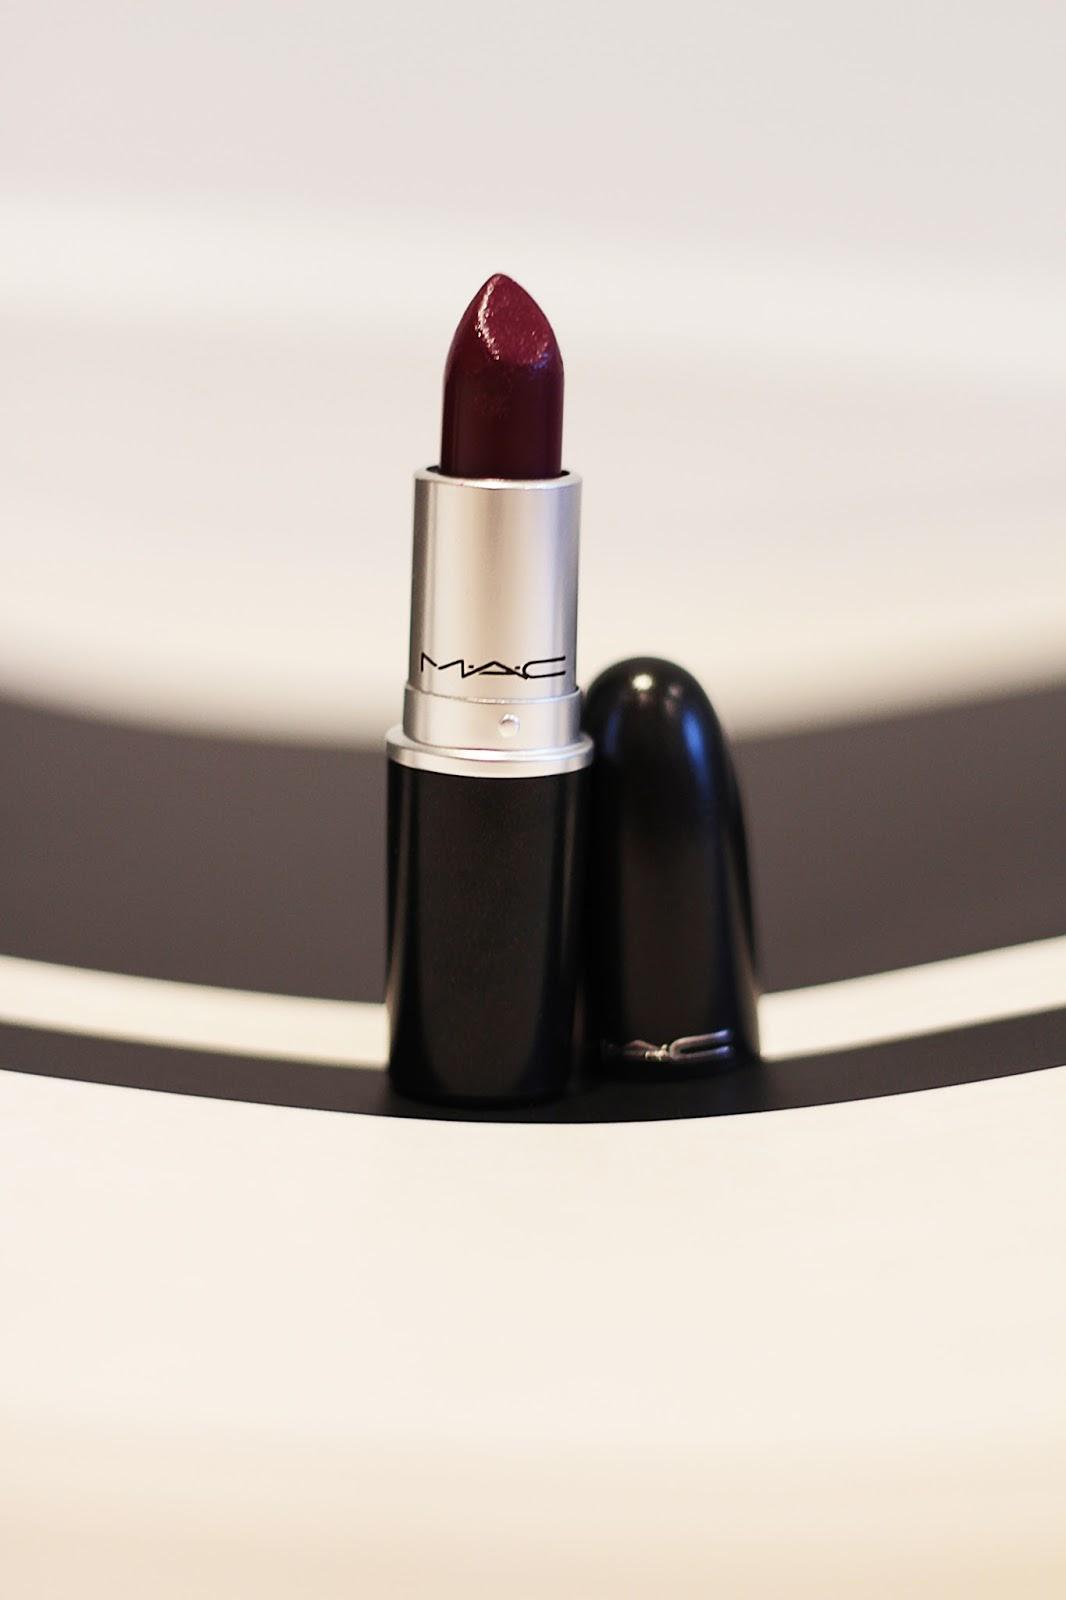 Rebel MAC cosmetics lipstick first impressions